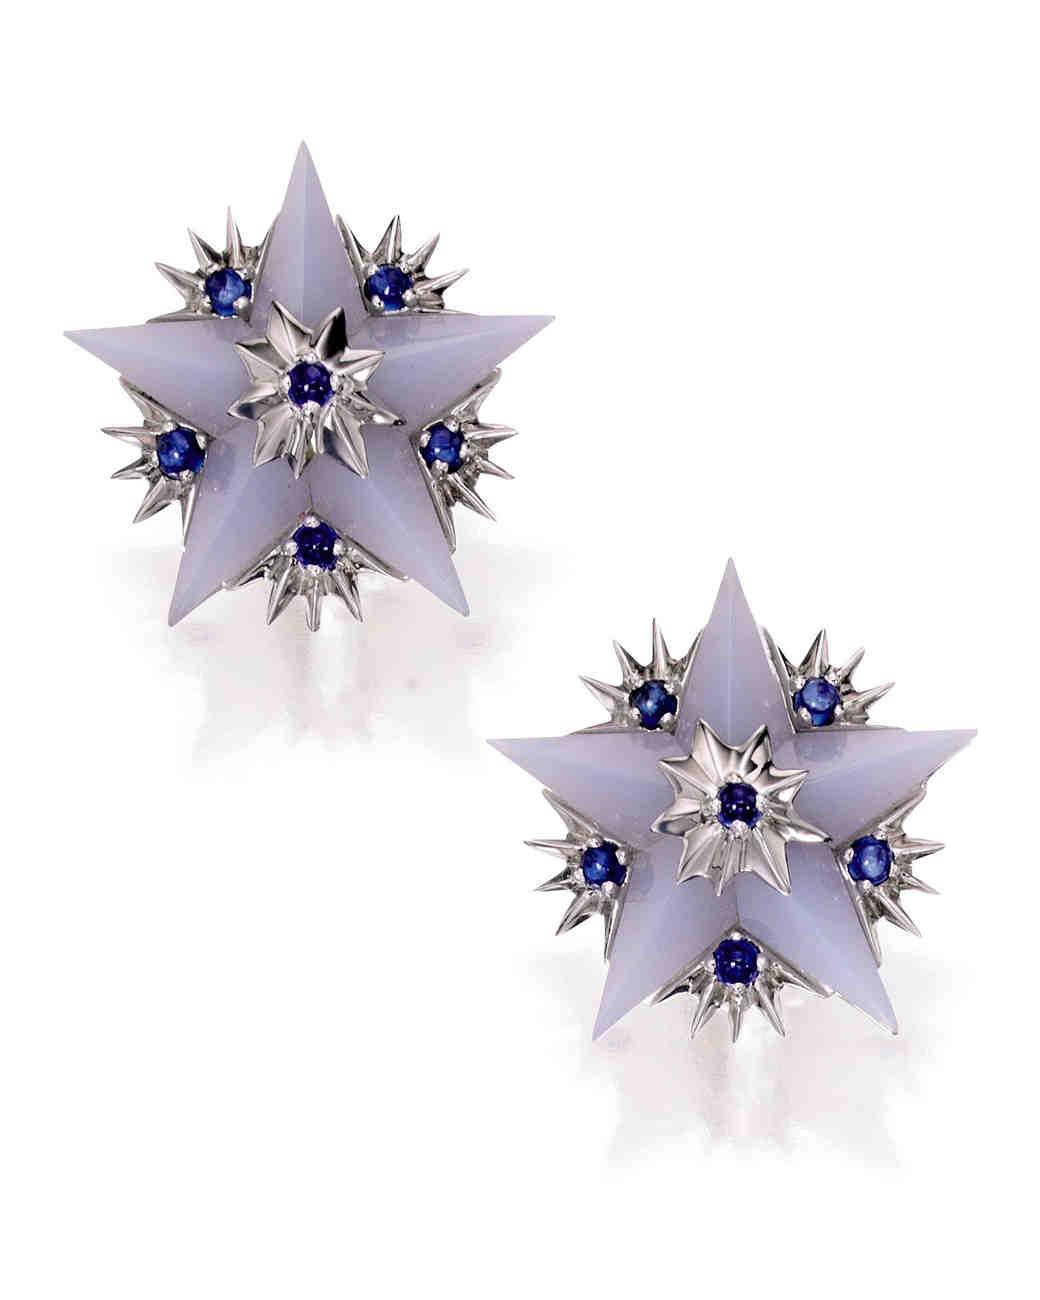 sothebys-ebay-auction-9331-lot-171-0415.jpg